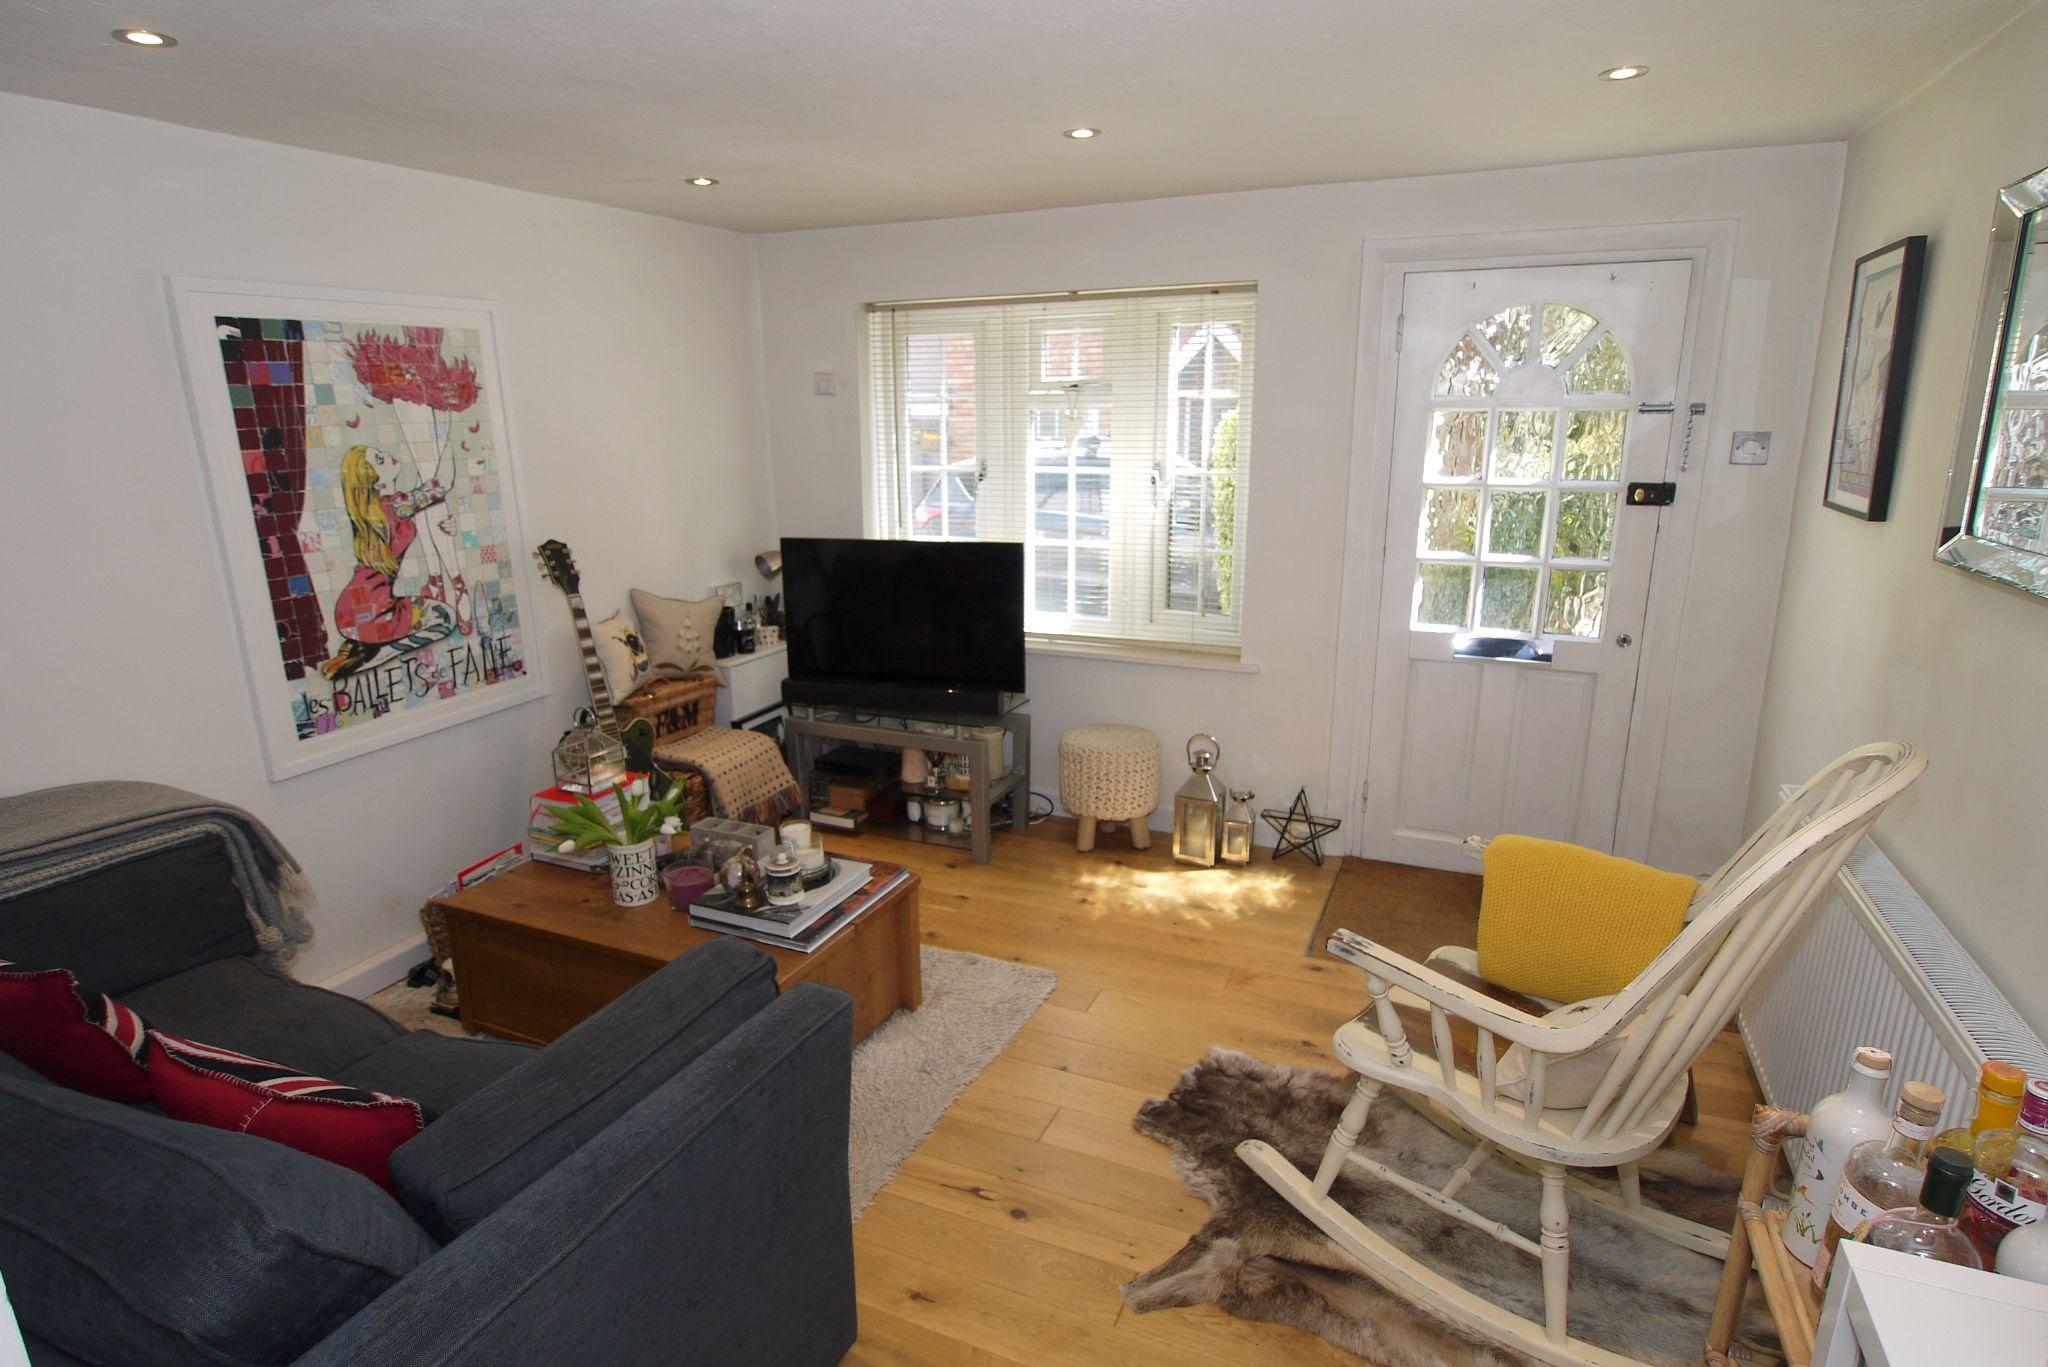 1 bedroom mid terraced house Sold in Sevenoaks - Photograph 2